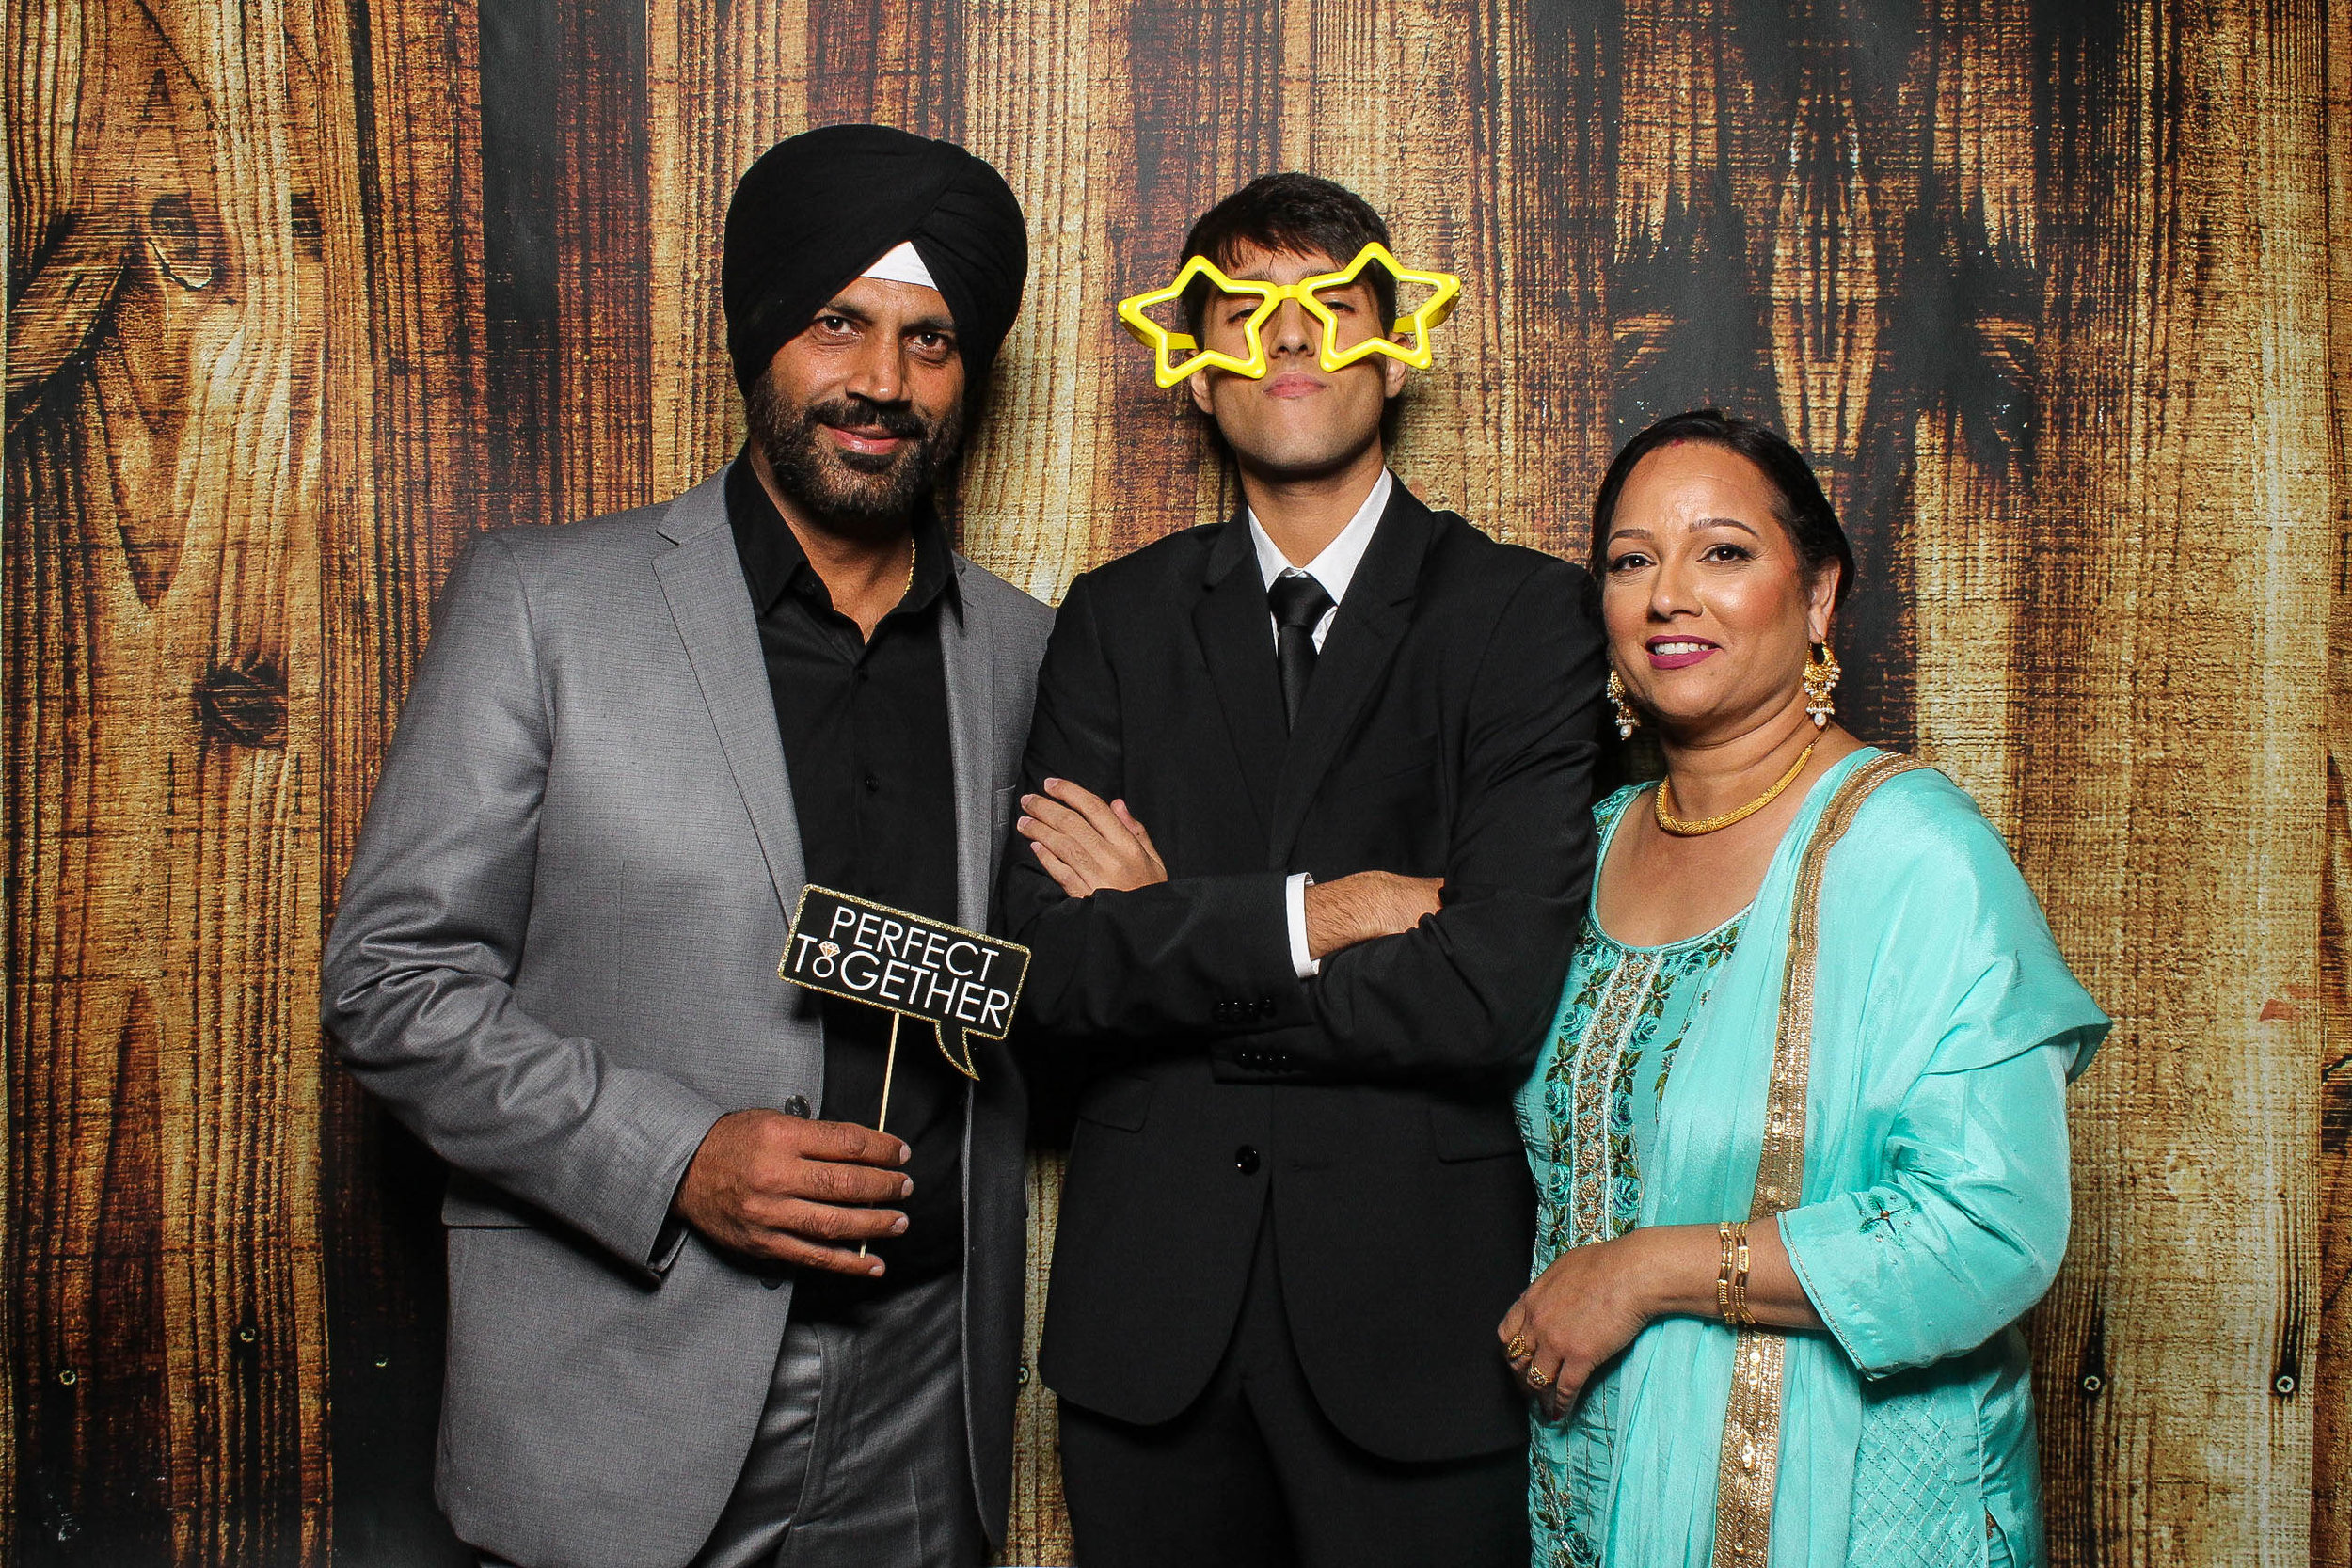 20190928_Singh-021.jpg